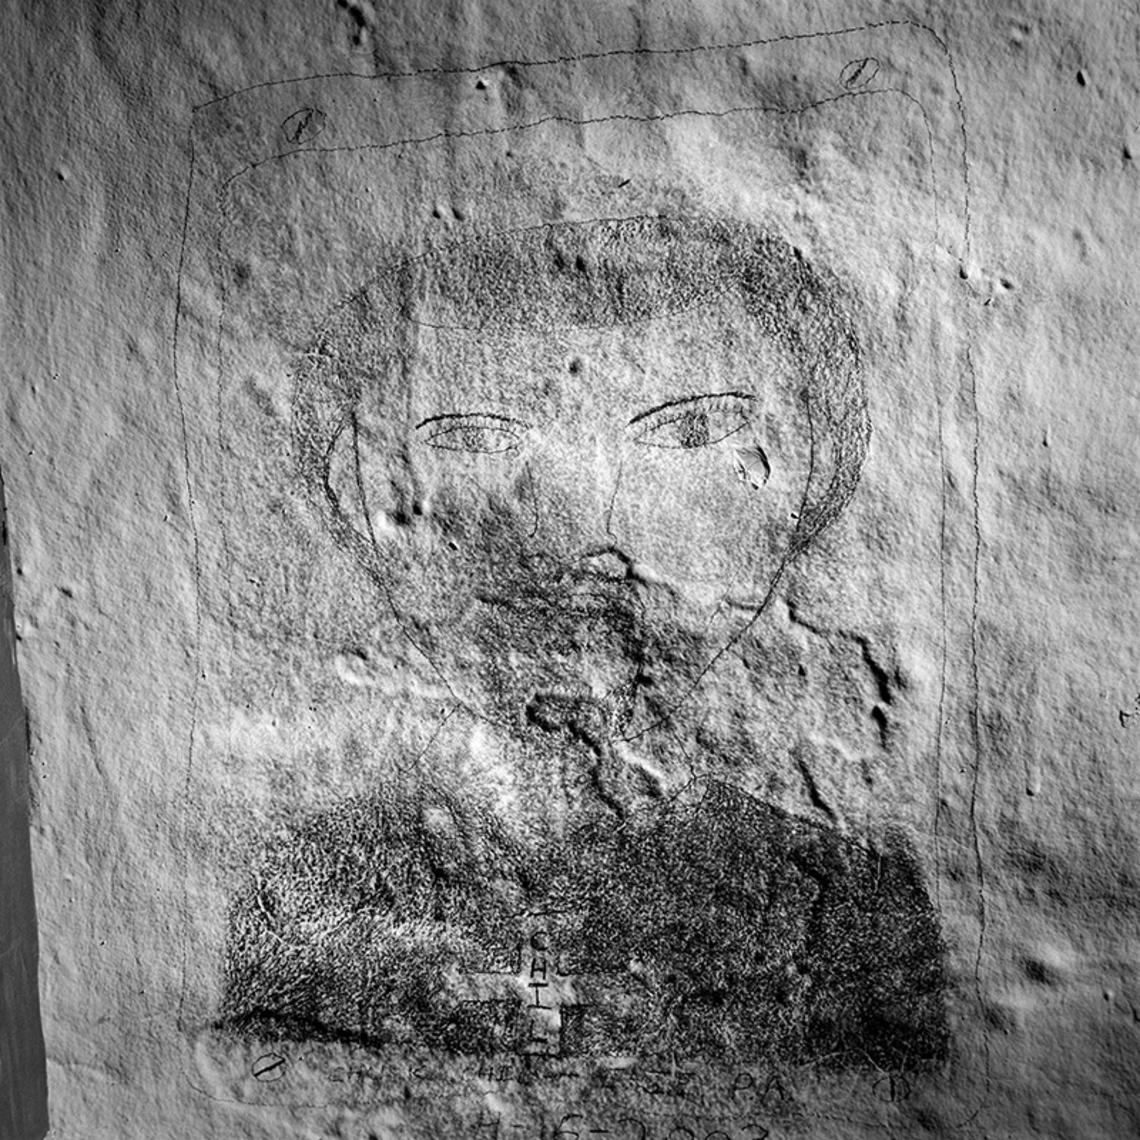 Prisoner's Self-Portrait